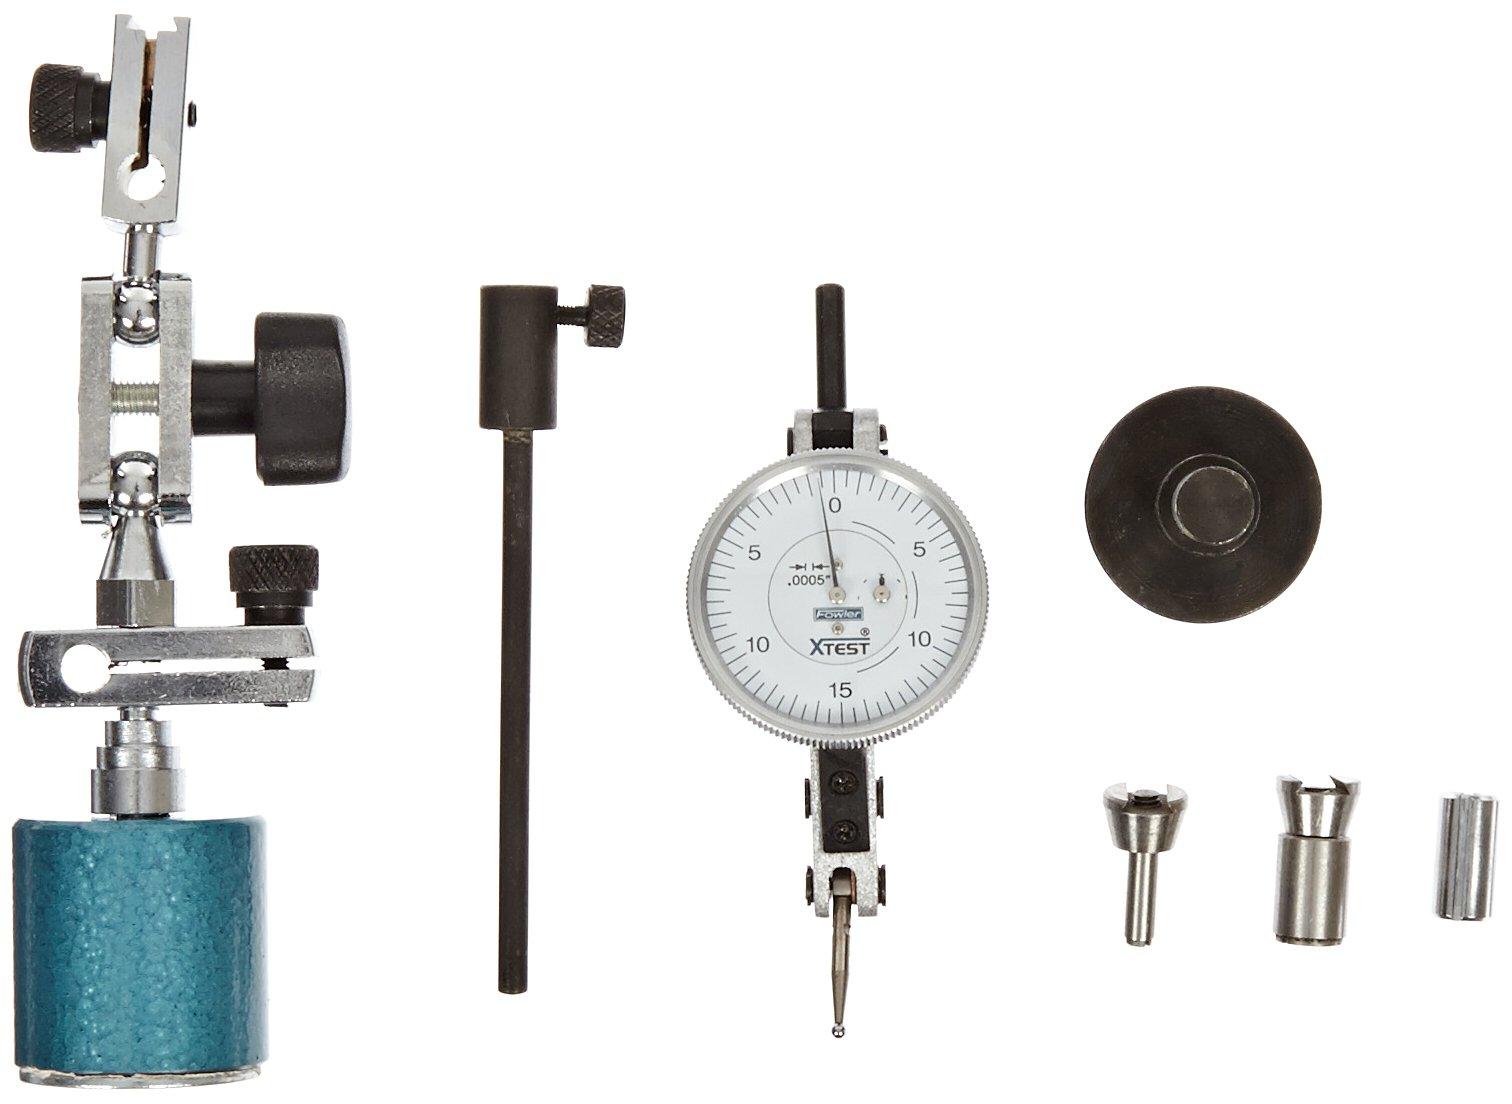 "Fowler 52-562-105 X-Test and Xtra-Mag Combo Indicator, 0.0005"" Graduation Interval, 0.060"" Maximum Measuring Range, 1.5"" Diameter"